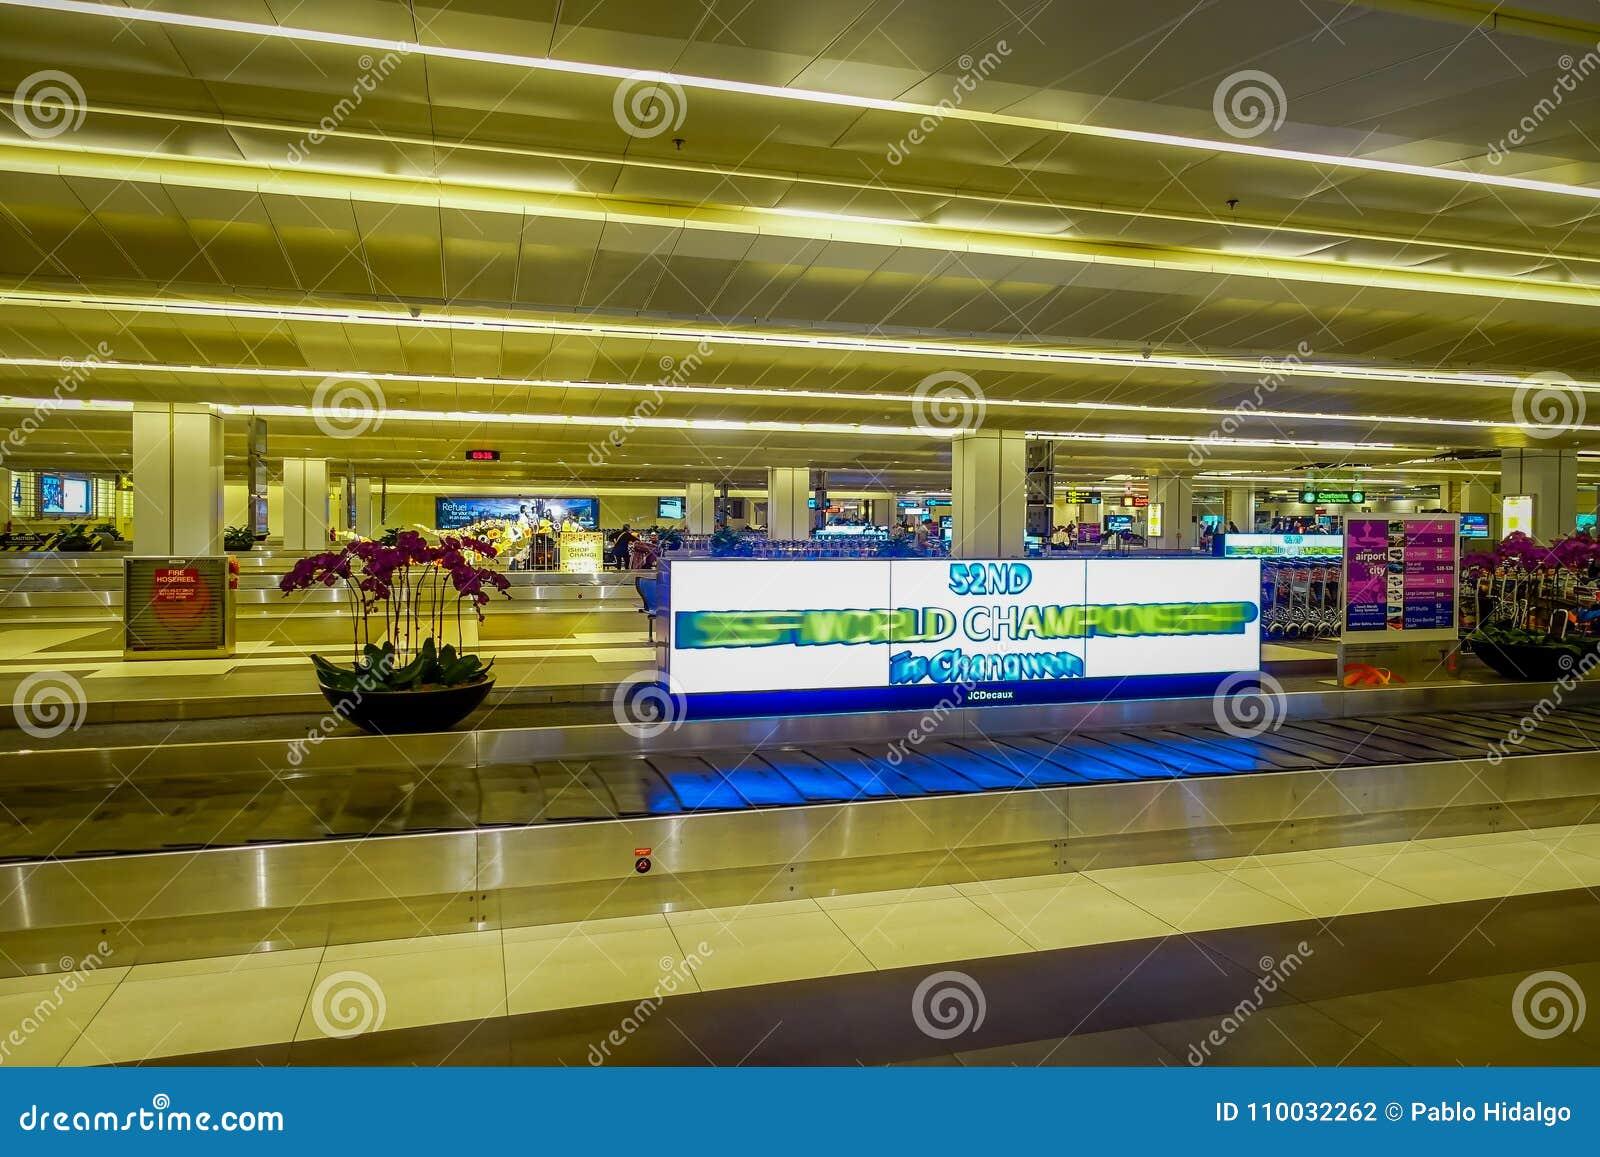 SINGAPORE, SINGAPORE - JANUARI 30 2018: Binnenvieww van bagagebandgebied van Changi Luchthaven De Luchthaven van Singapore Changi